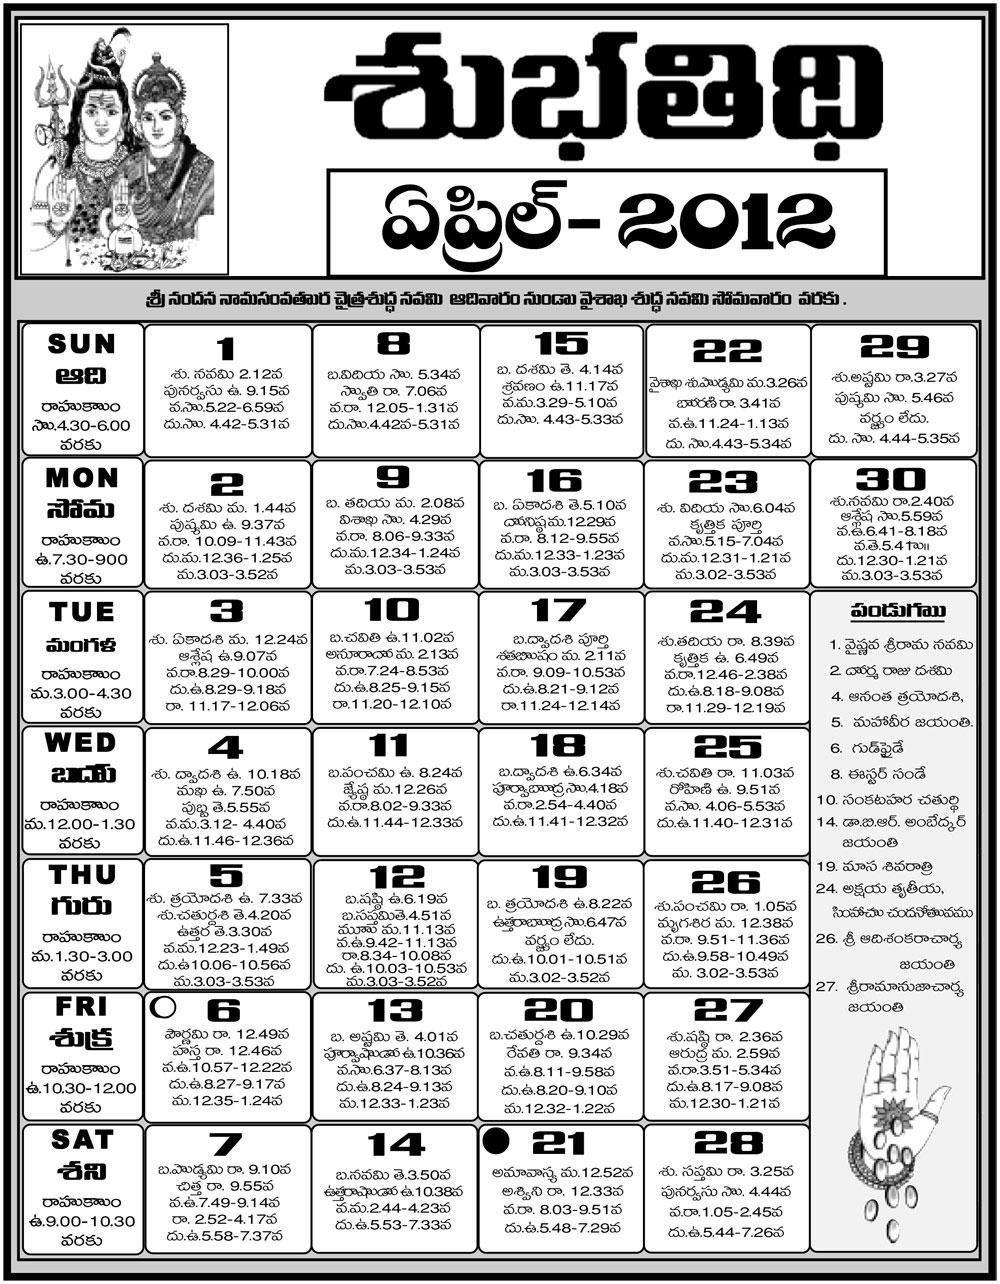 2016 Telugu Calendar | New Calendar Template Site